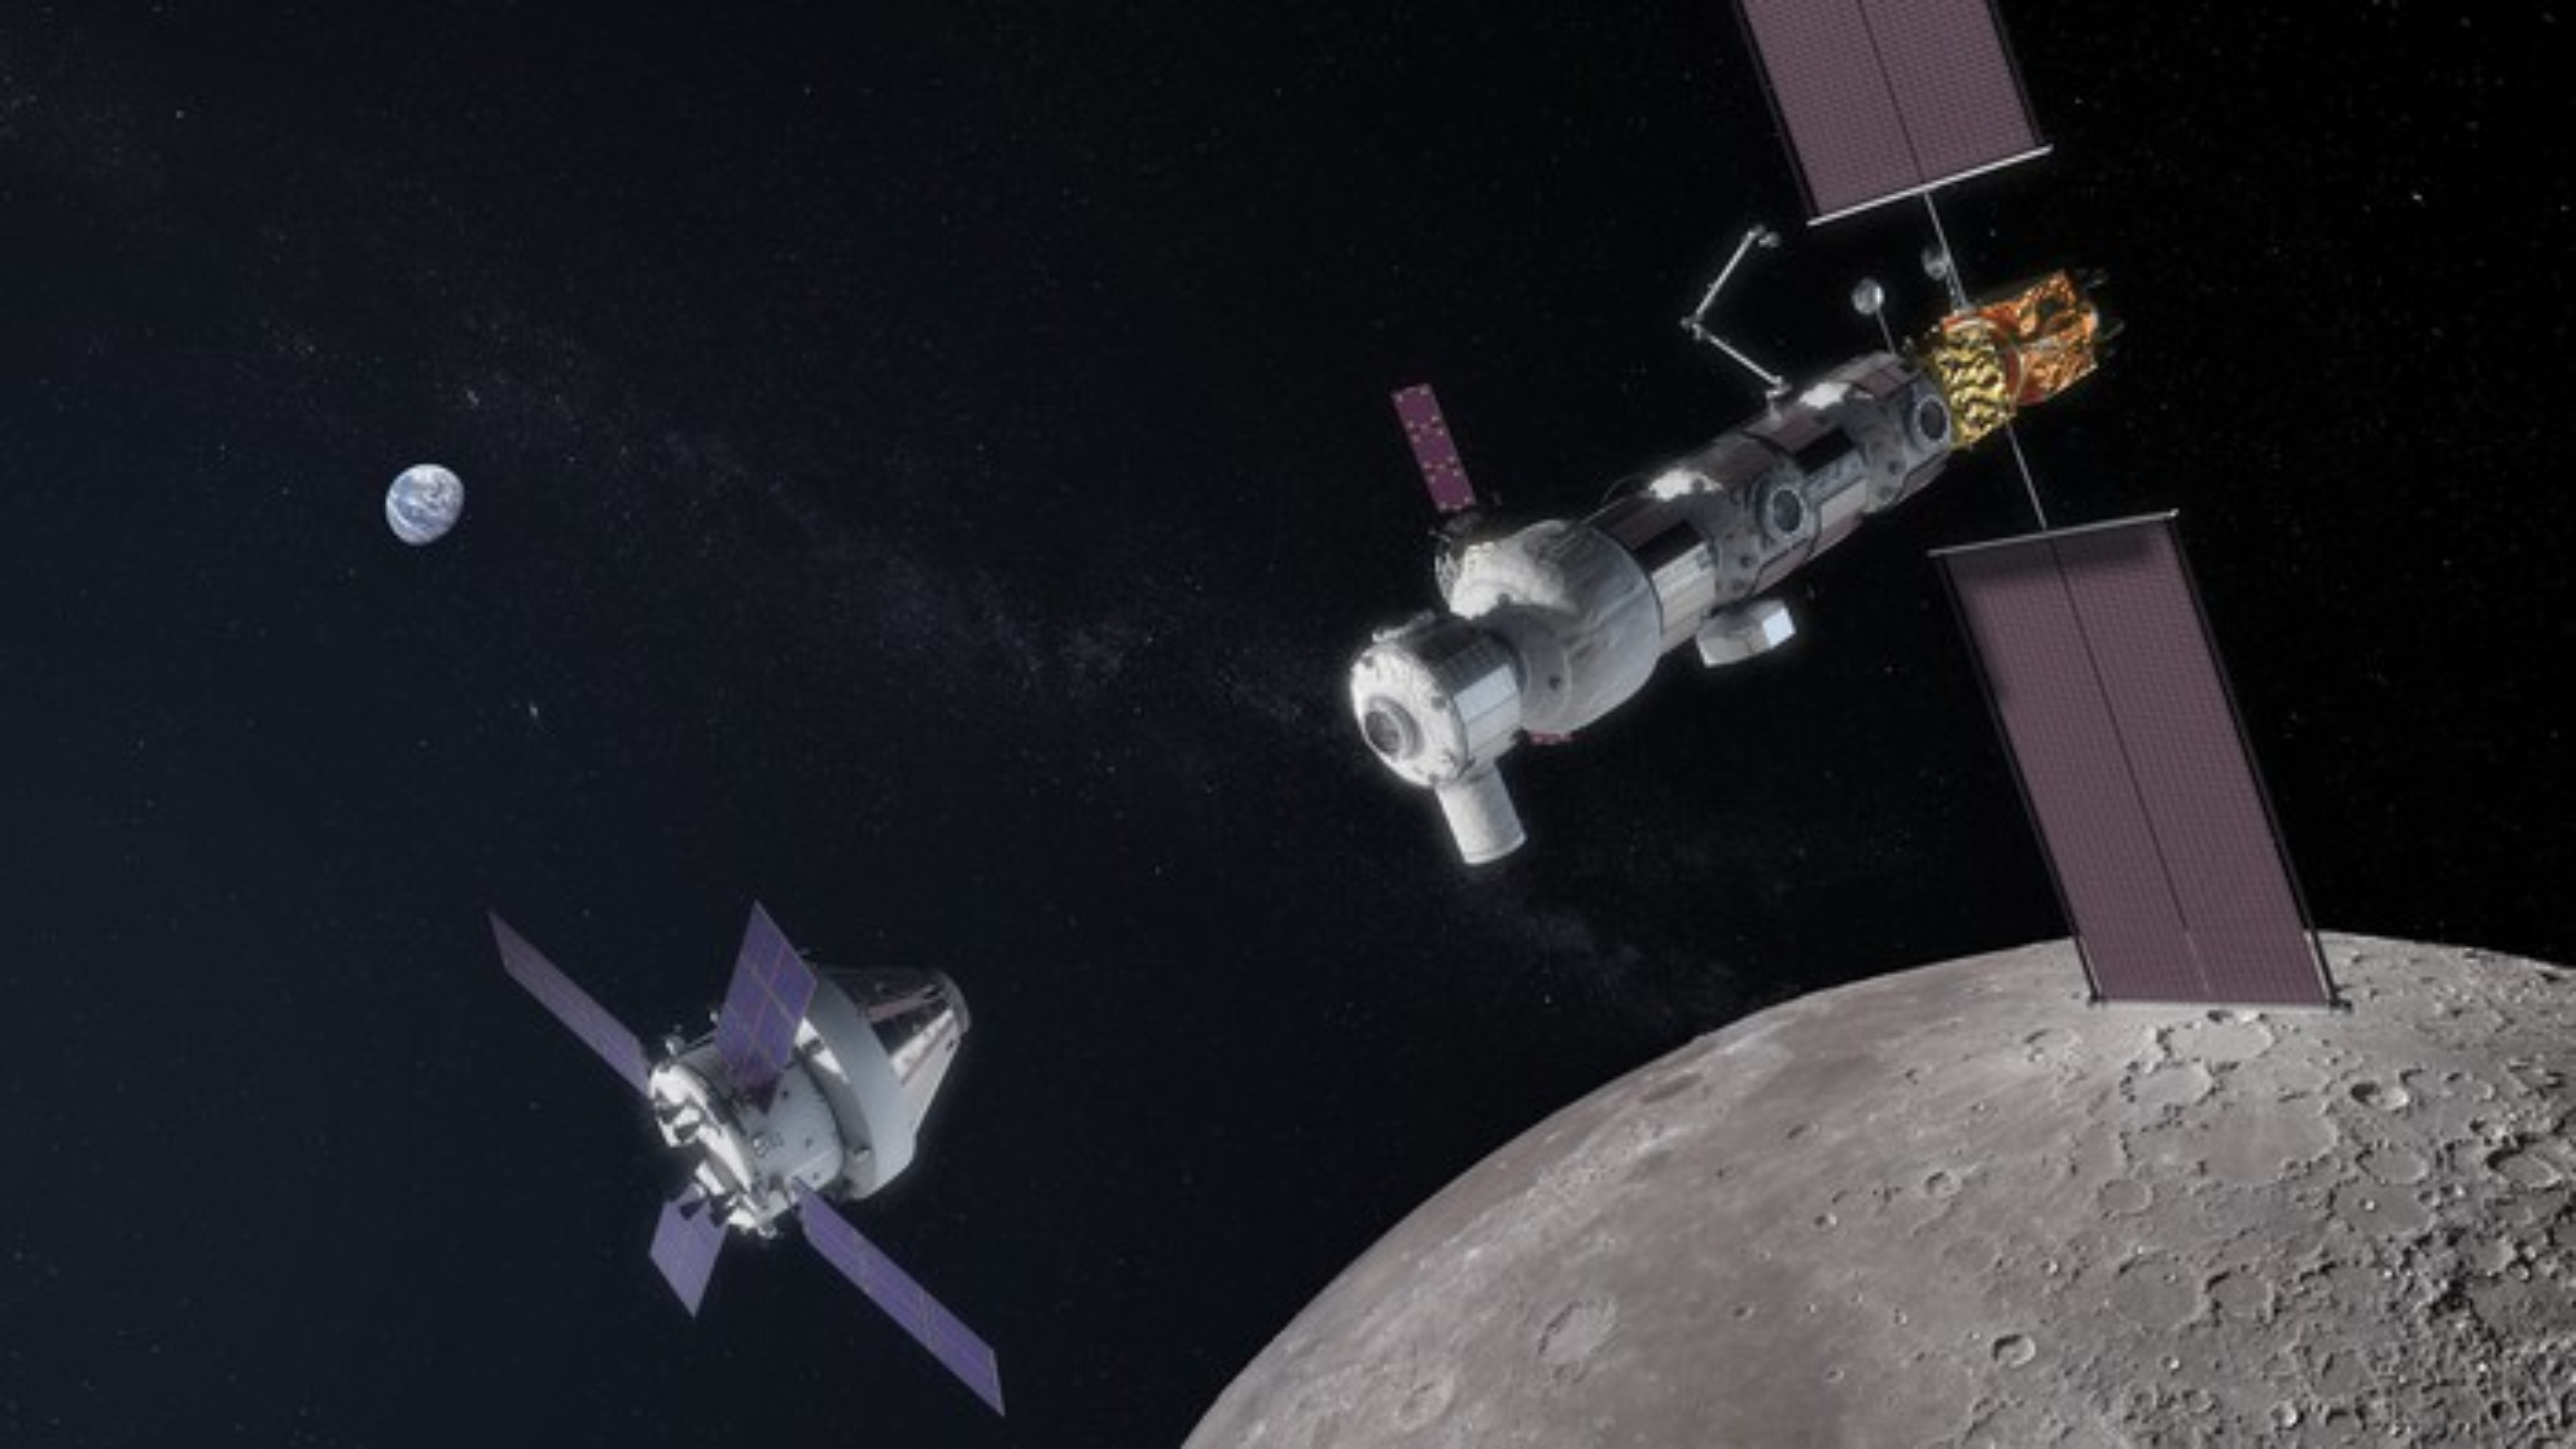 Artist's depiction of NASA's planned Lunar Gateway